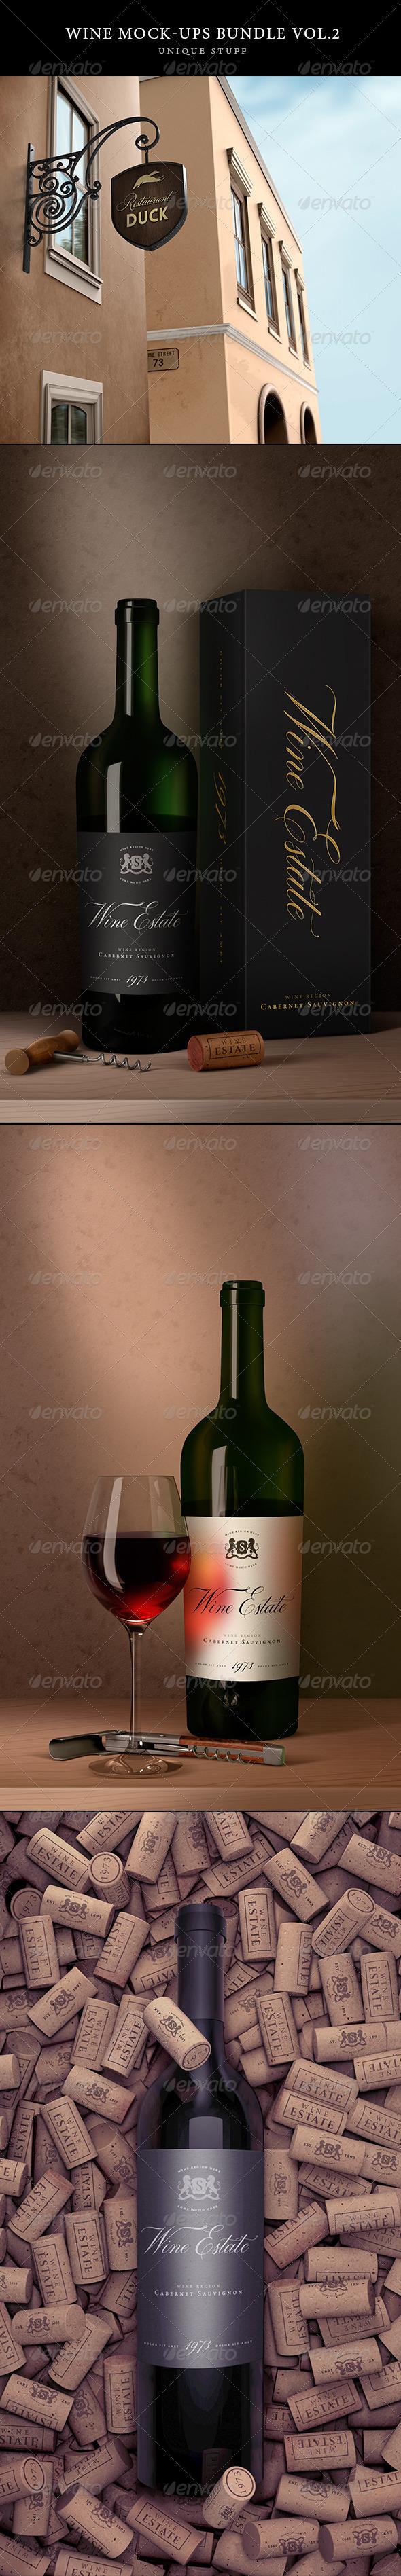 GraphicRiver Wine Branding Bundle Vol.2 8144996